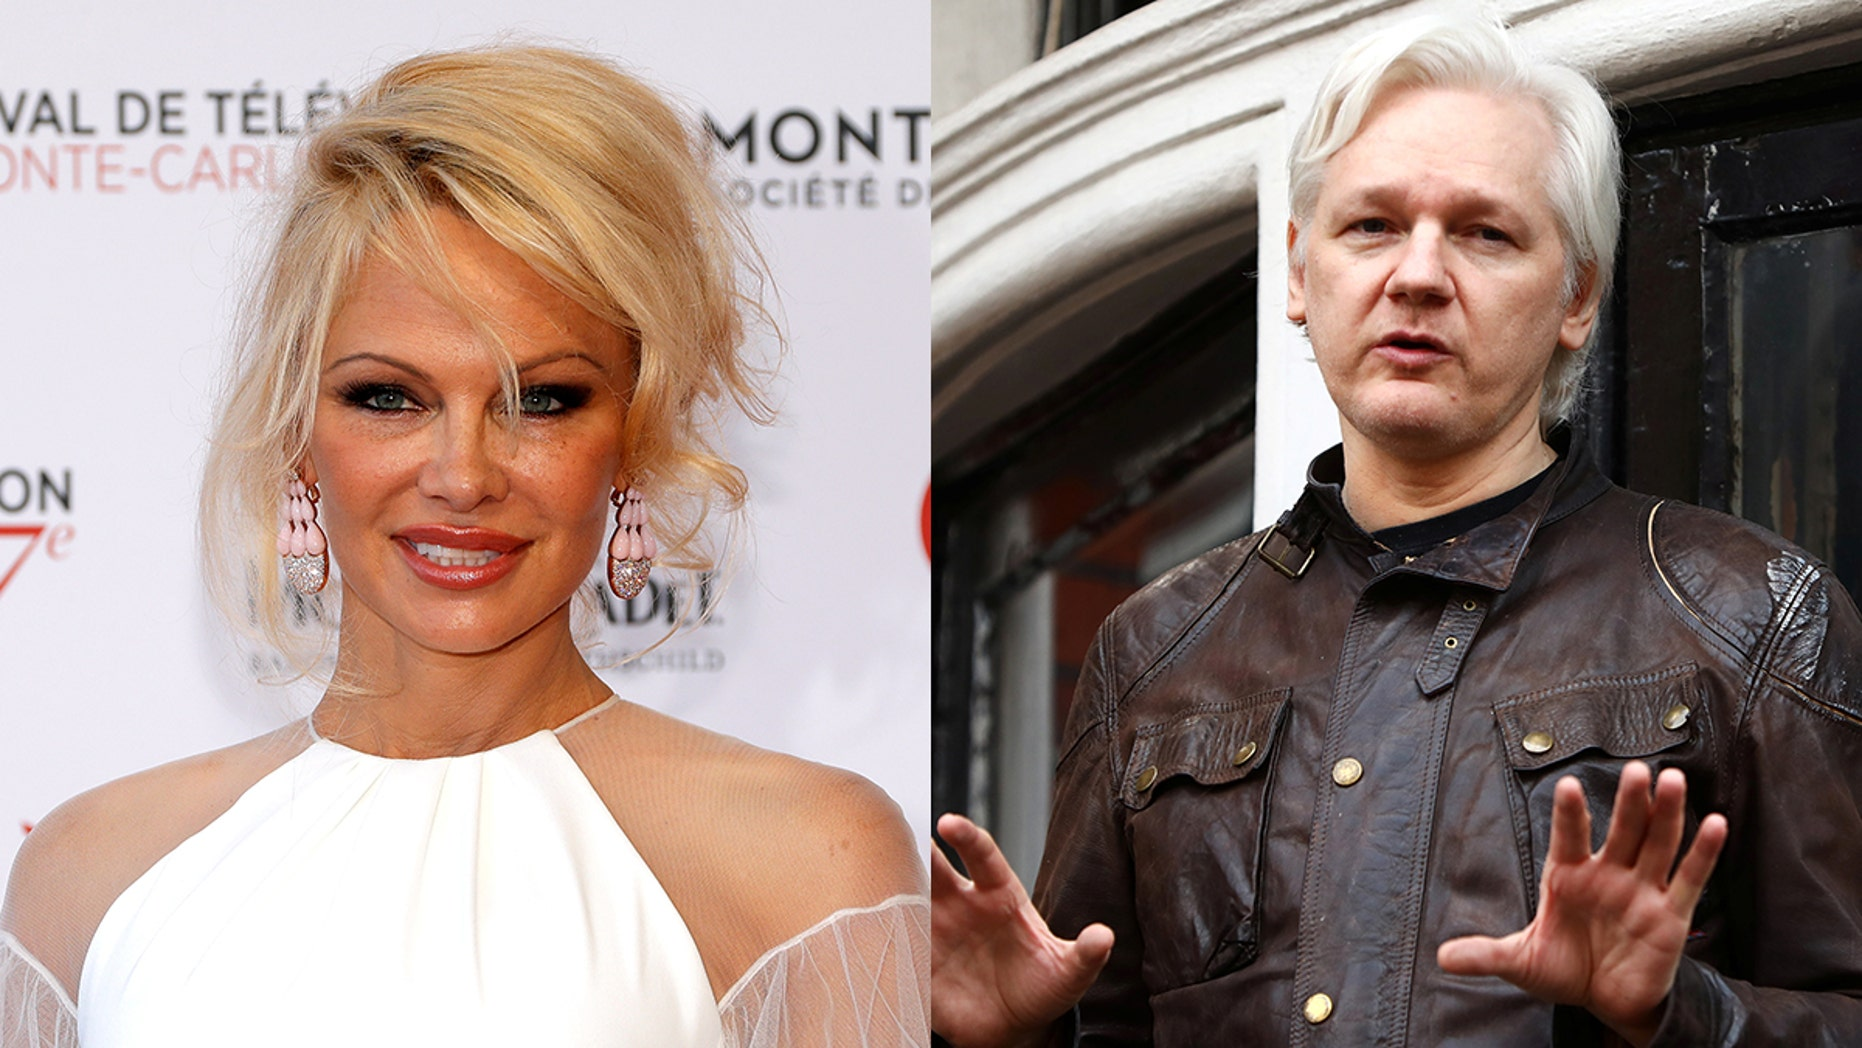 Pamela Anderson has been making regular visits to see Julian Assange.